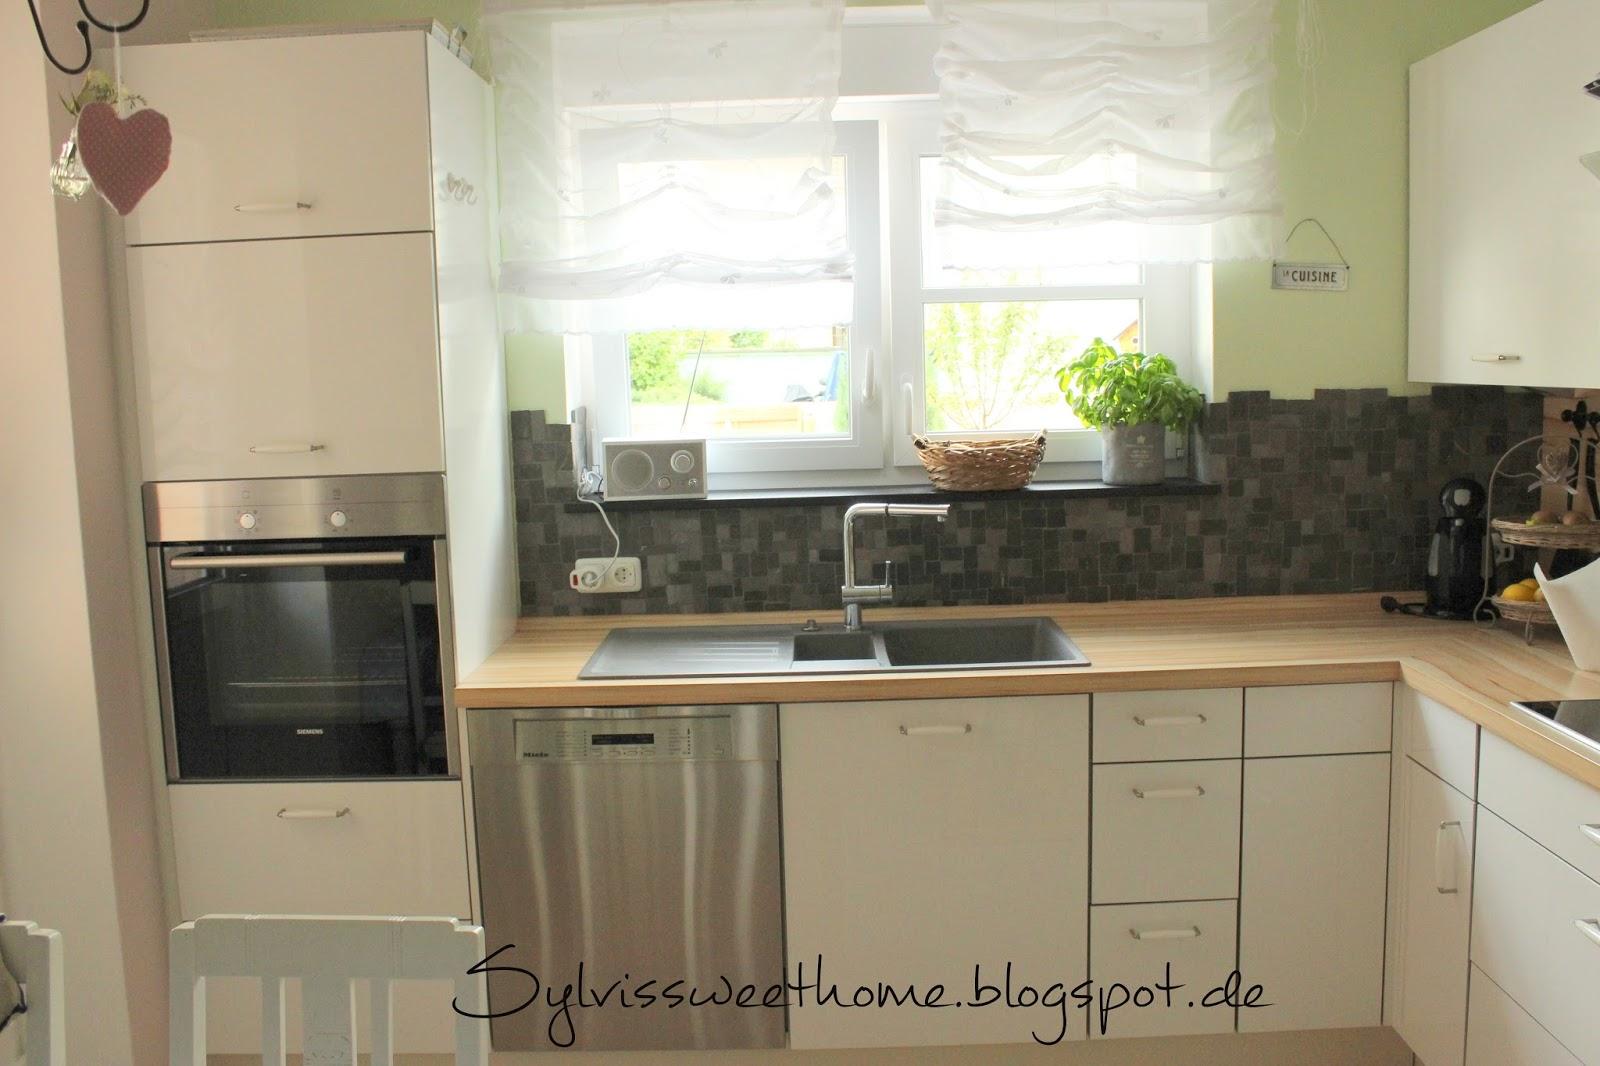 Sylvis Sweet Home: Küche